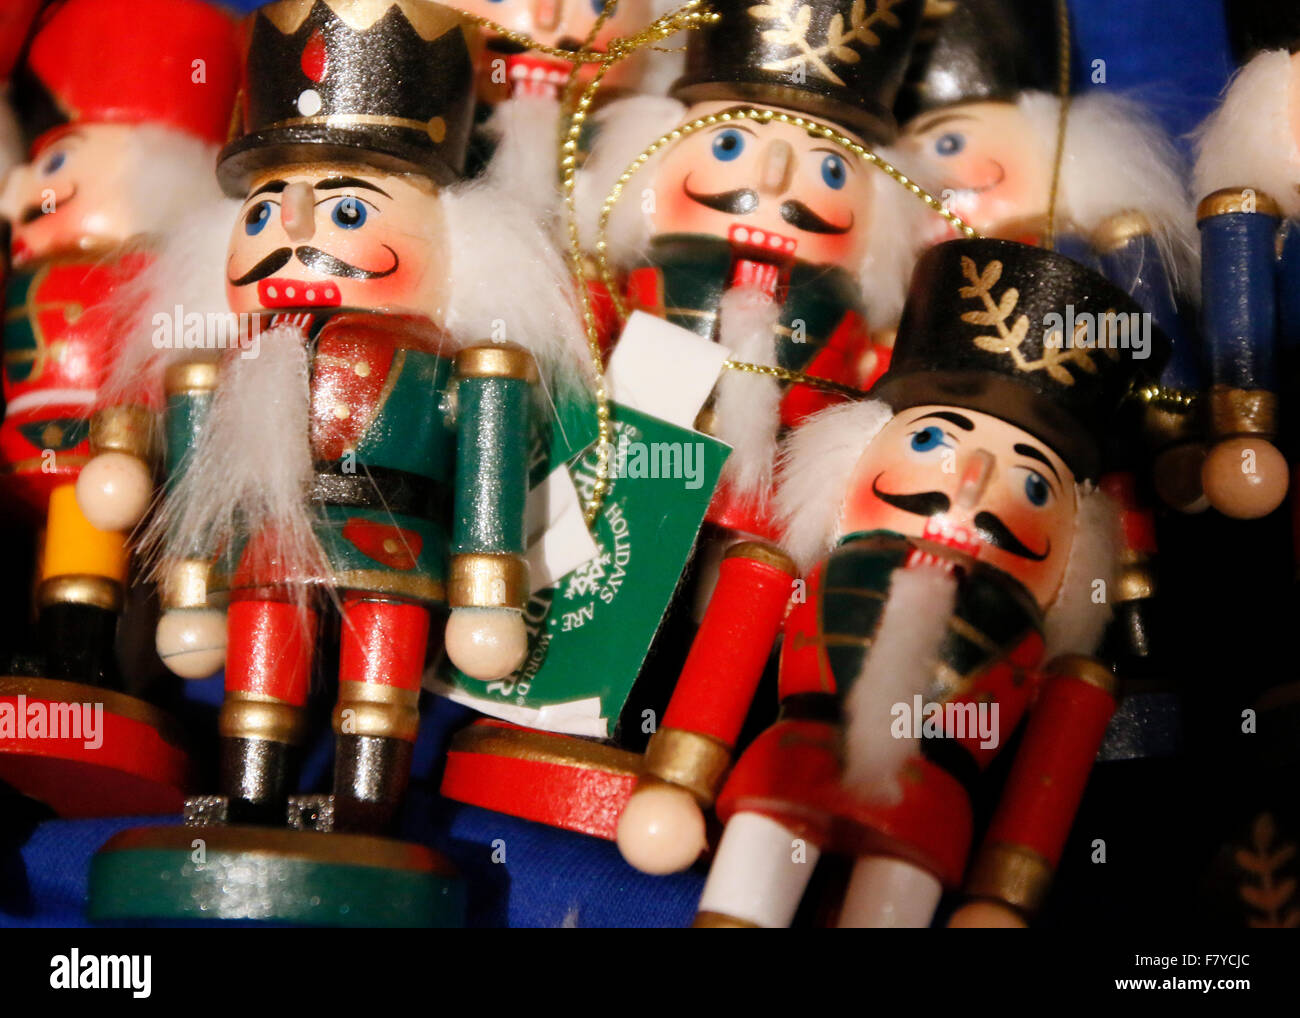 Christbaumschmuck Nussknacker Stockfoto Bild 90957060 Alamy